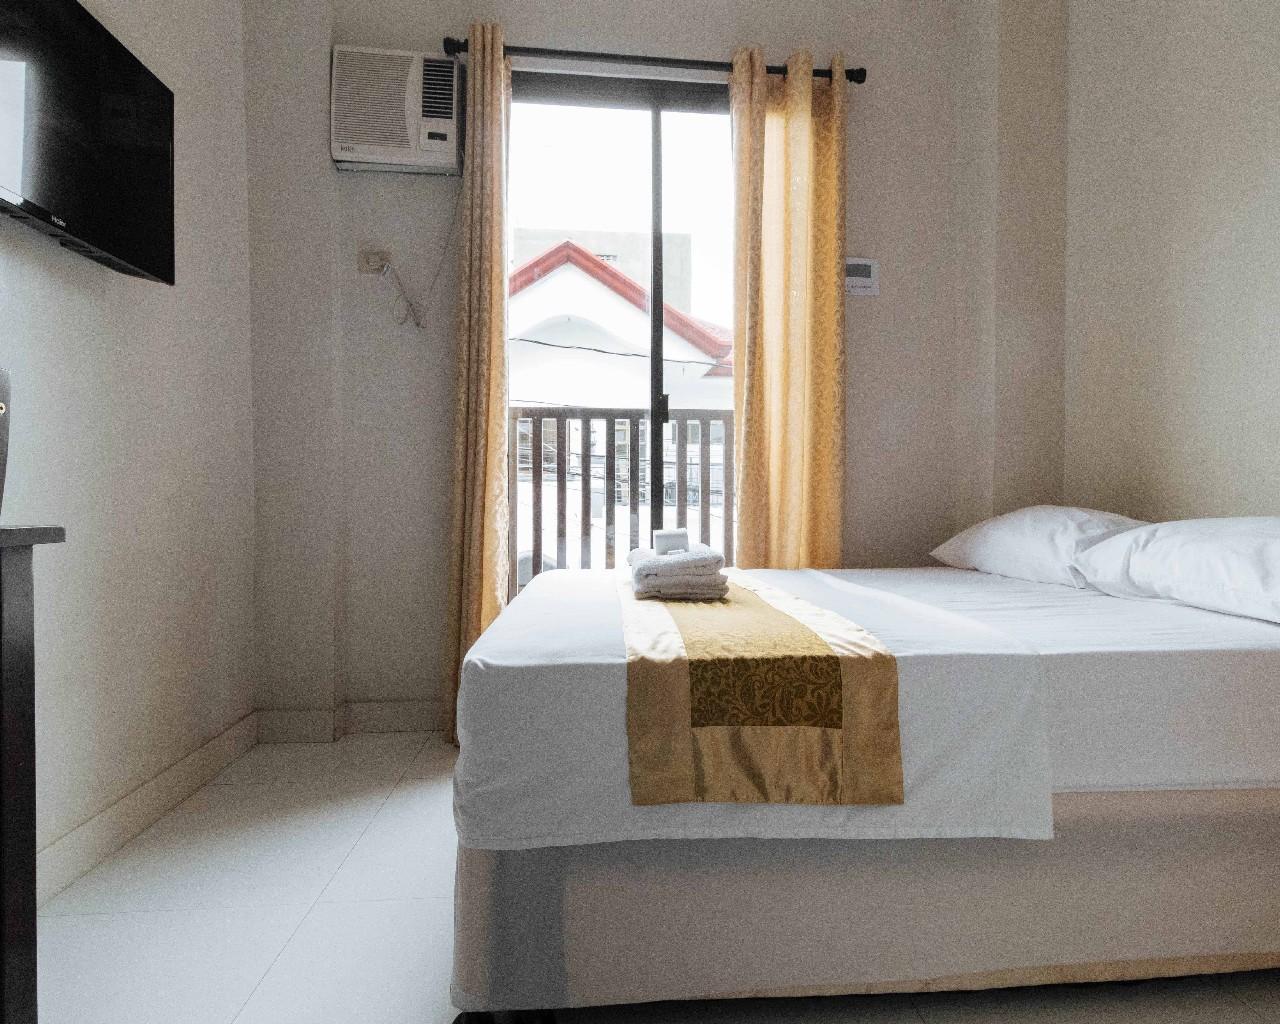 Blancafloor Room